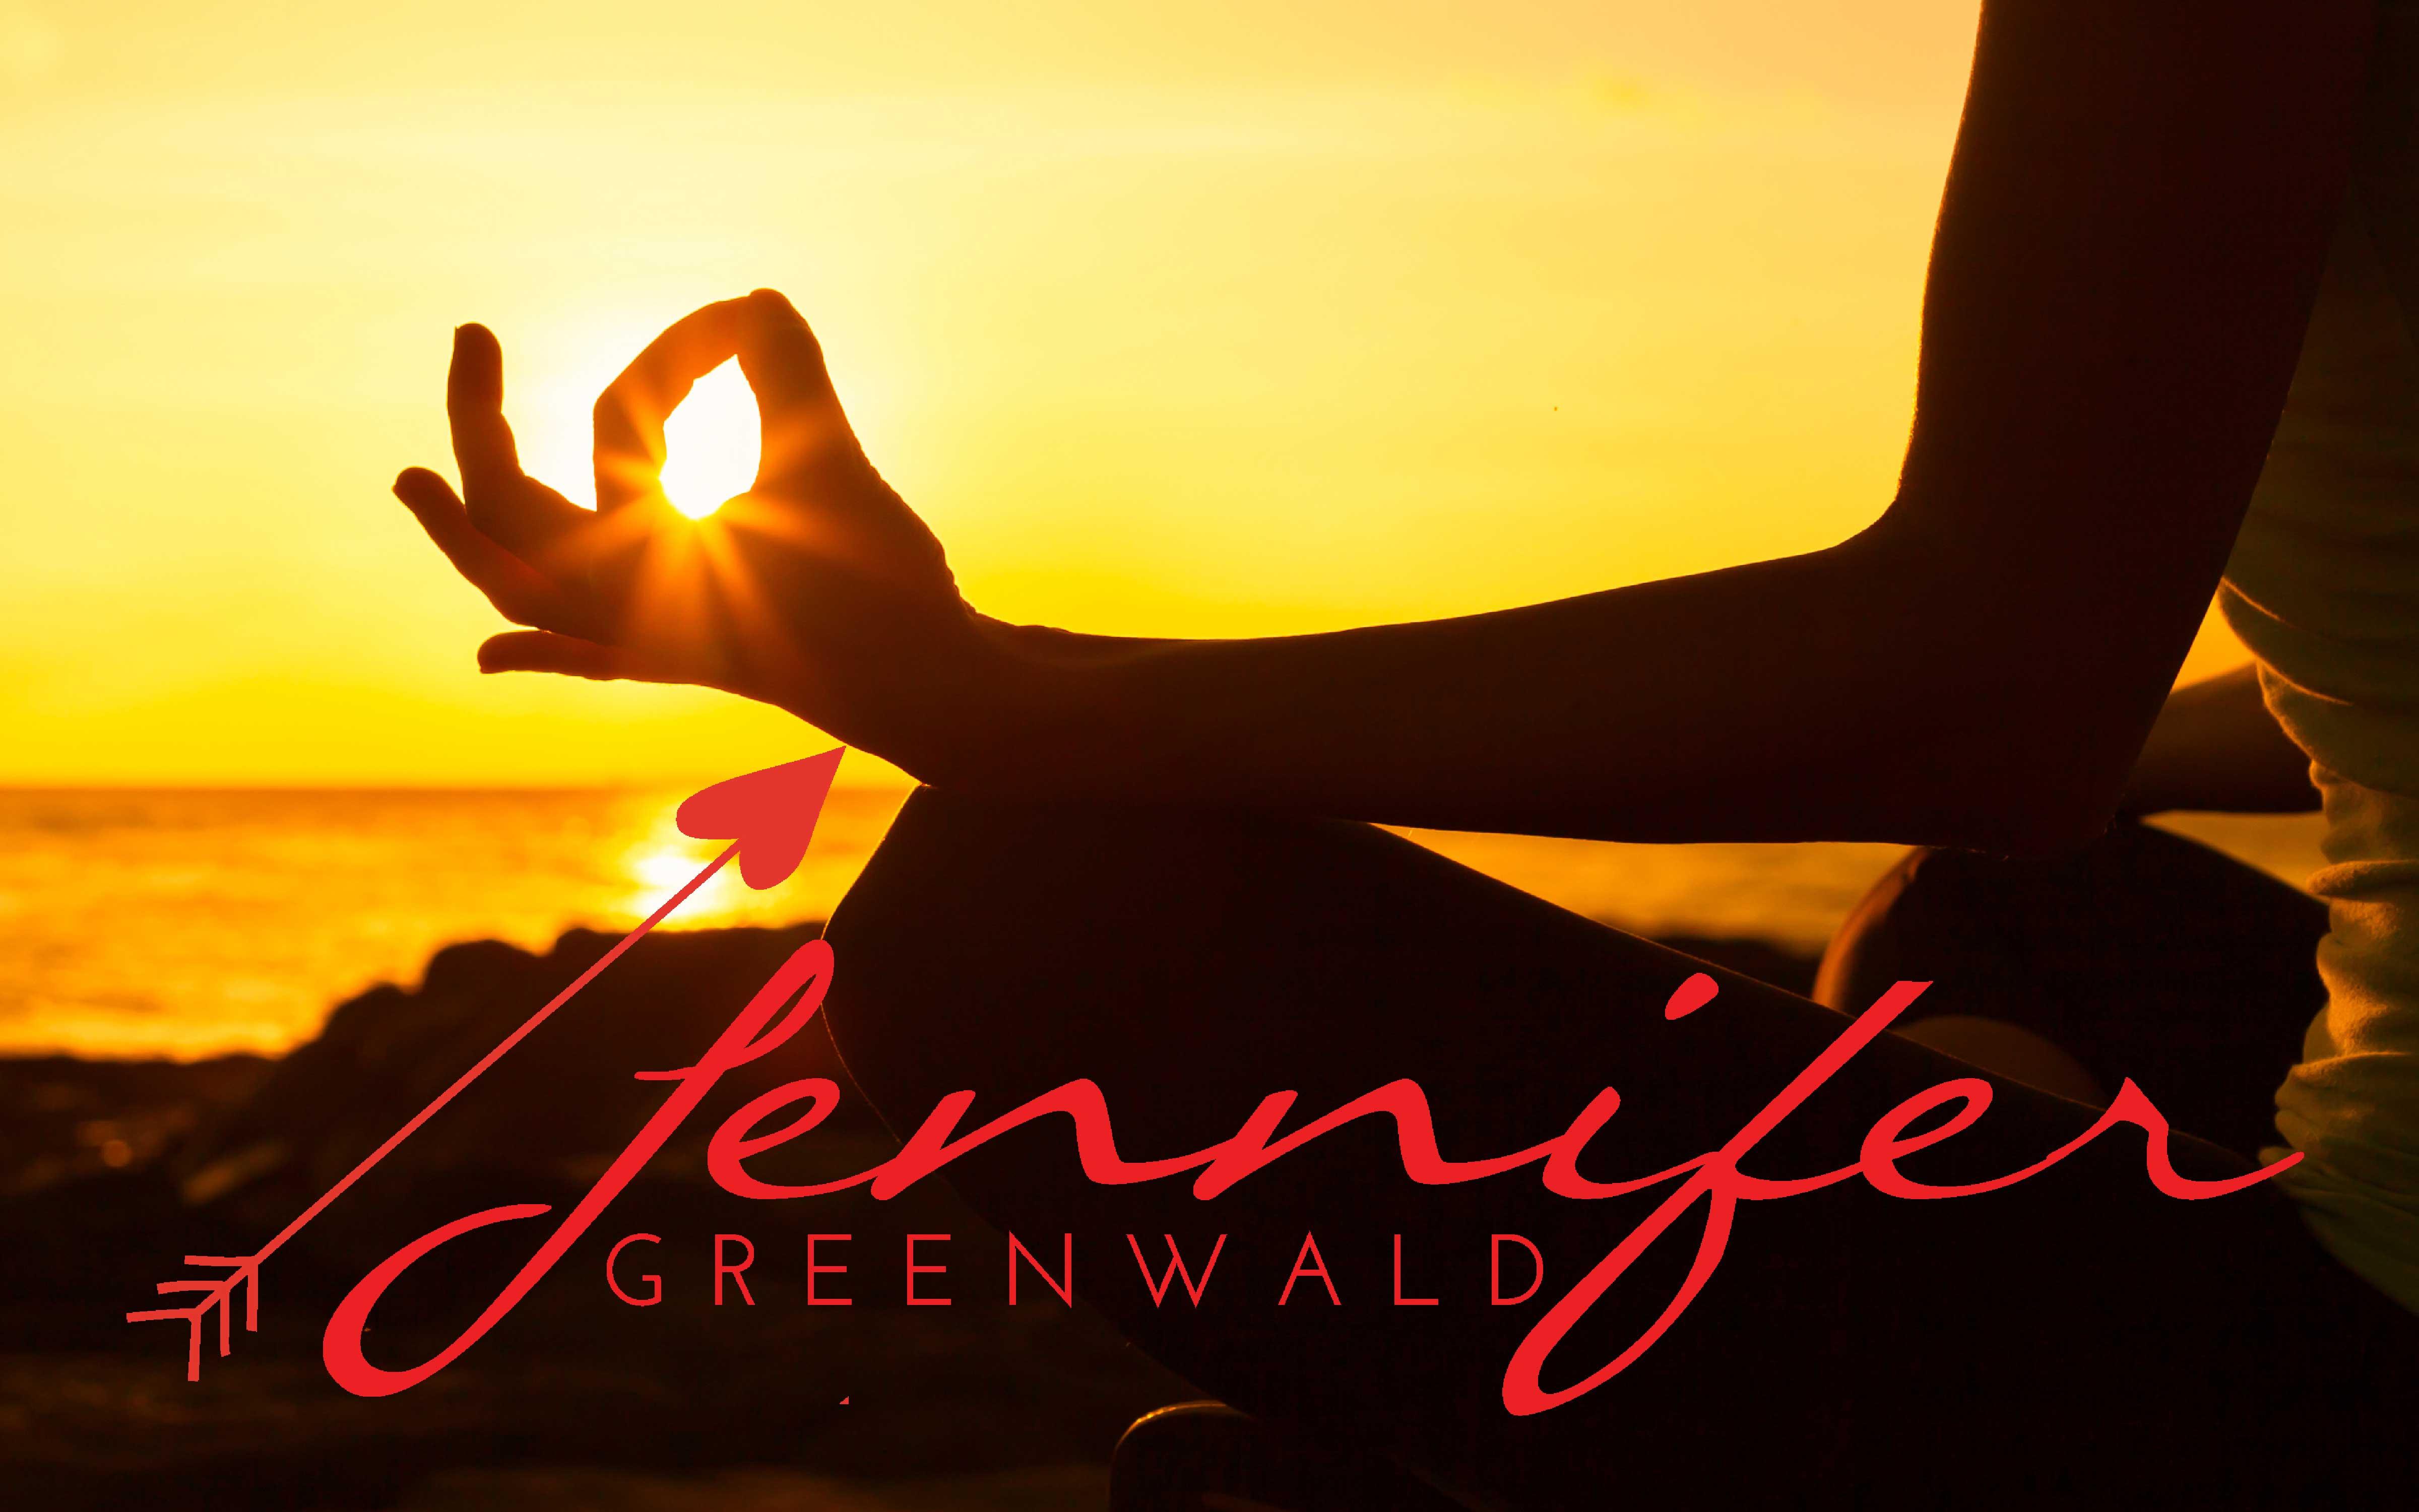 Jennifer_Greenwald